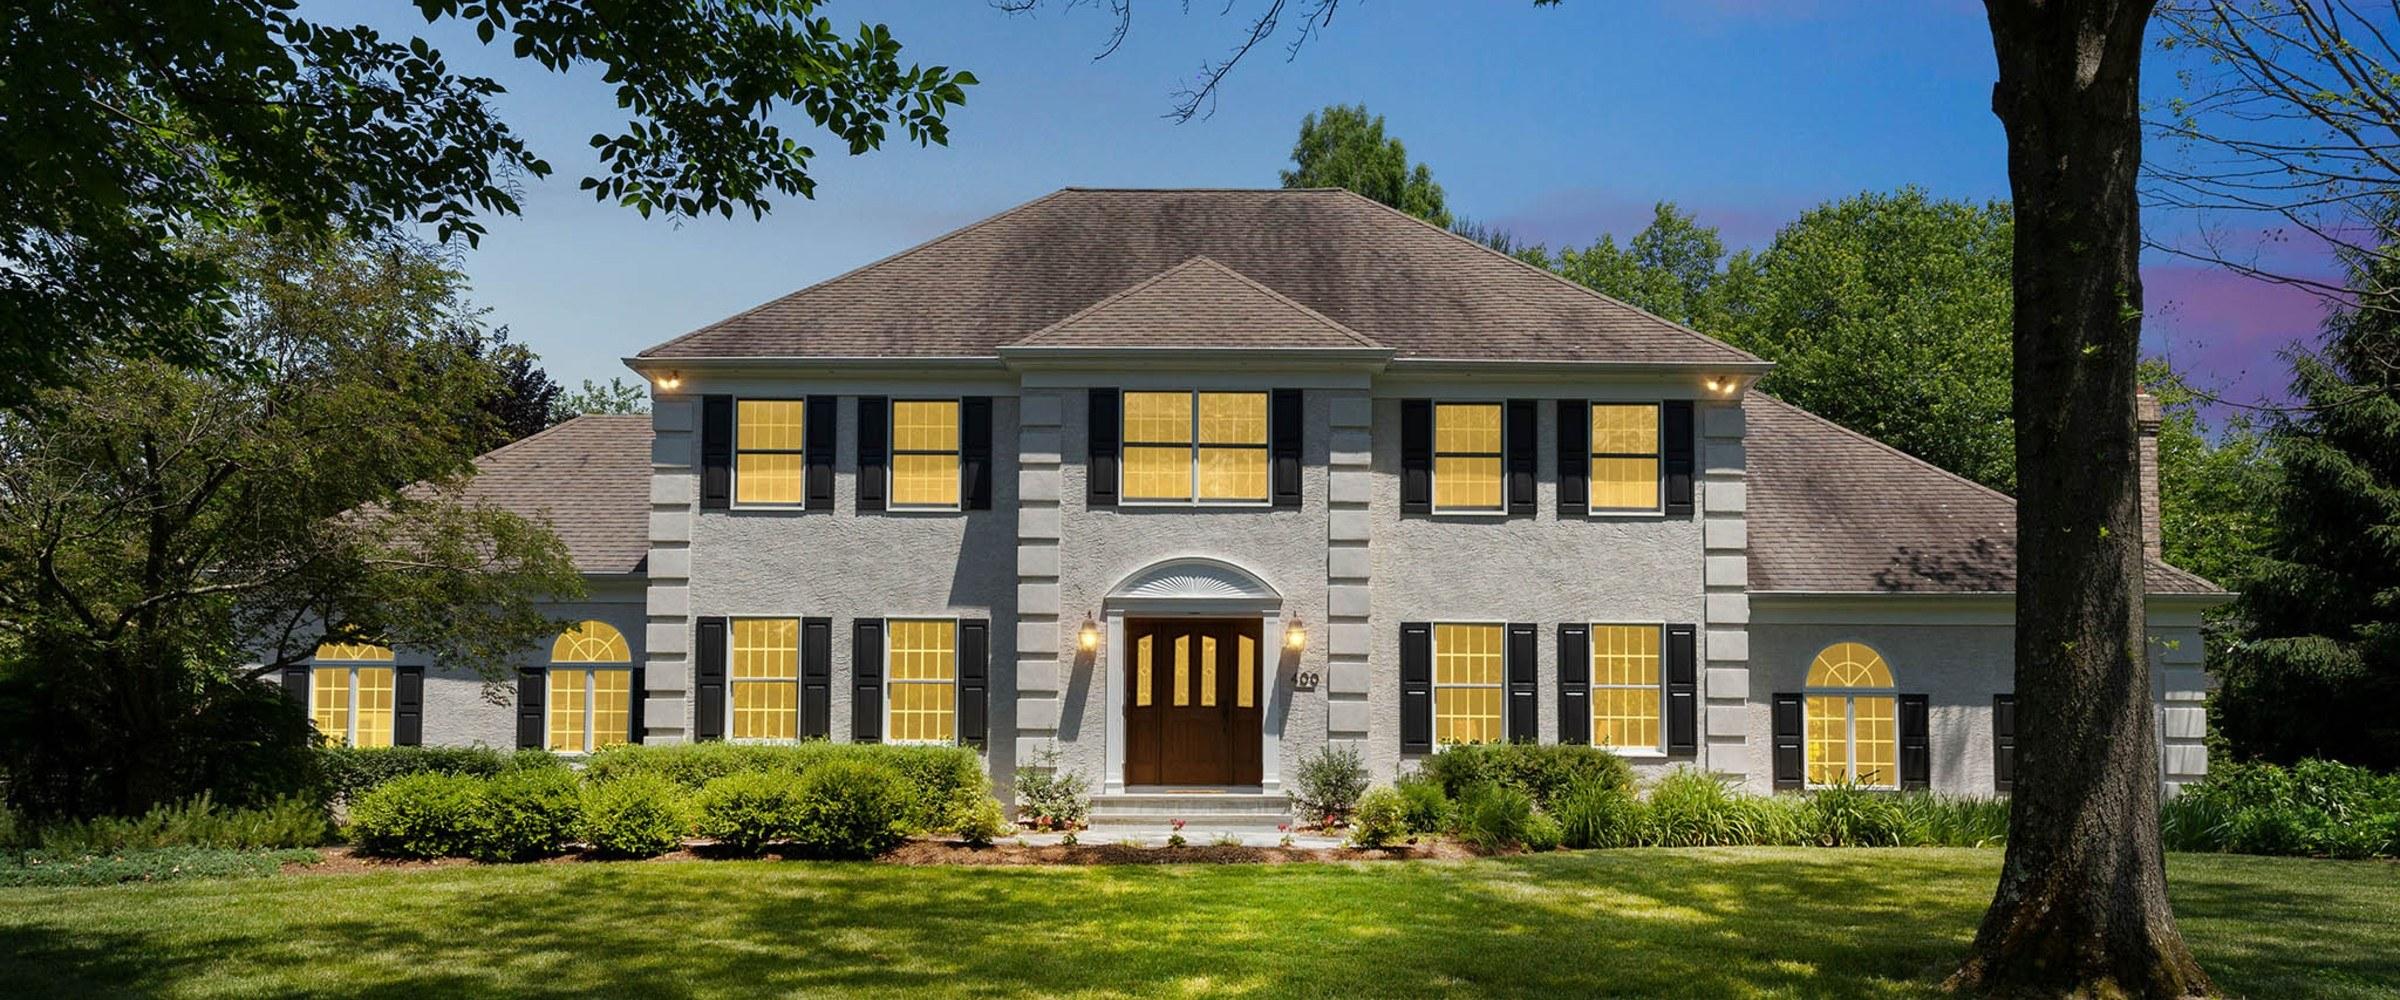 housing market outlook home